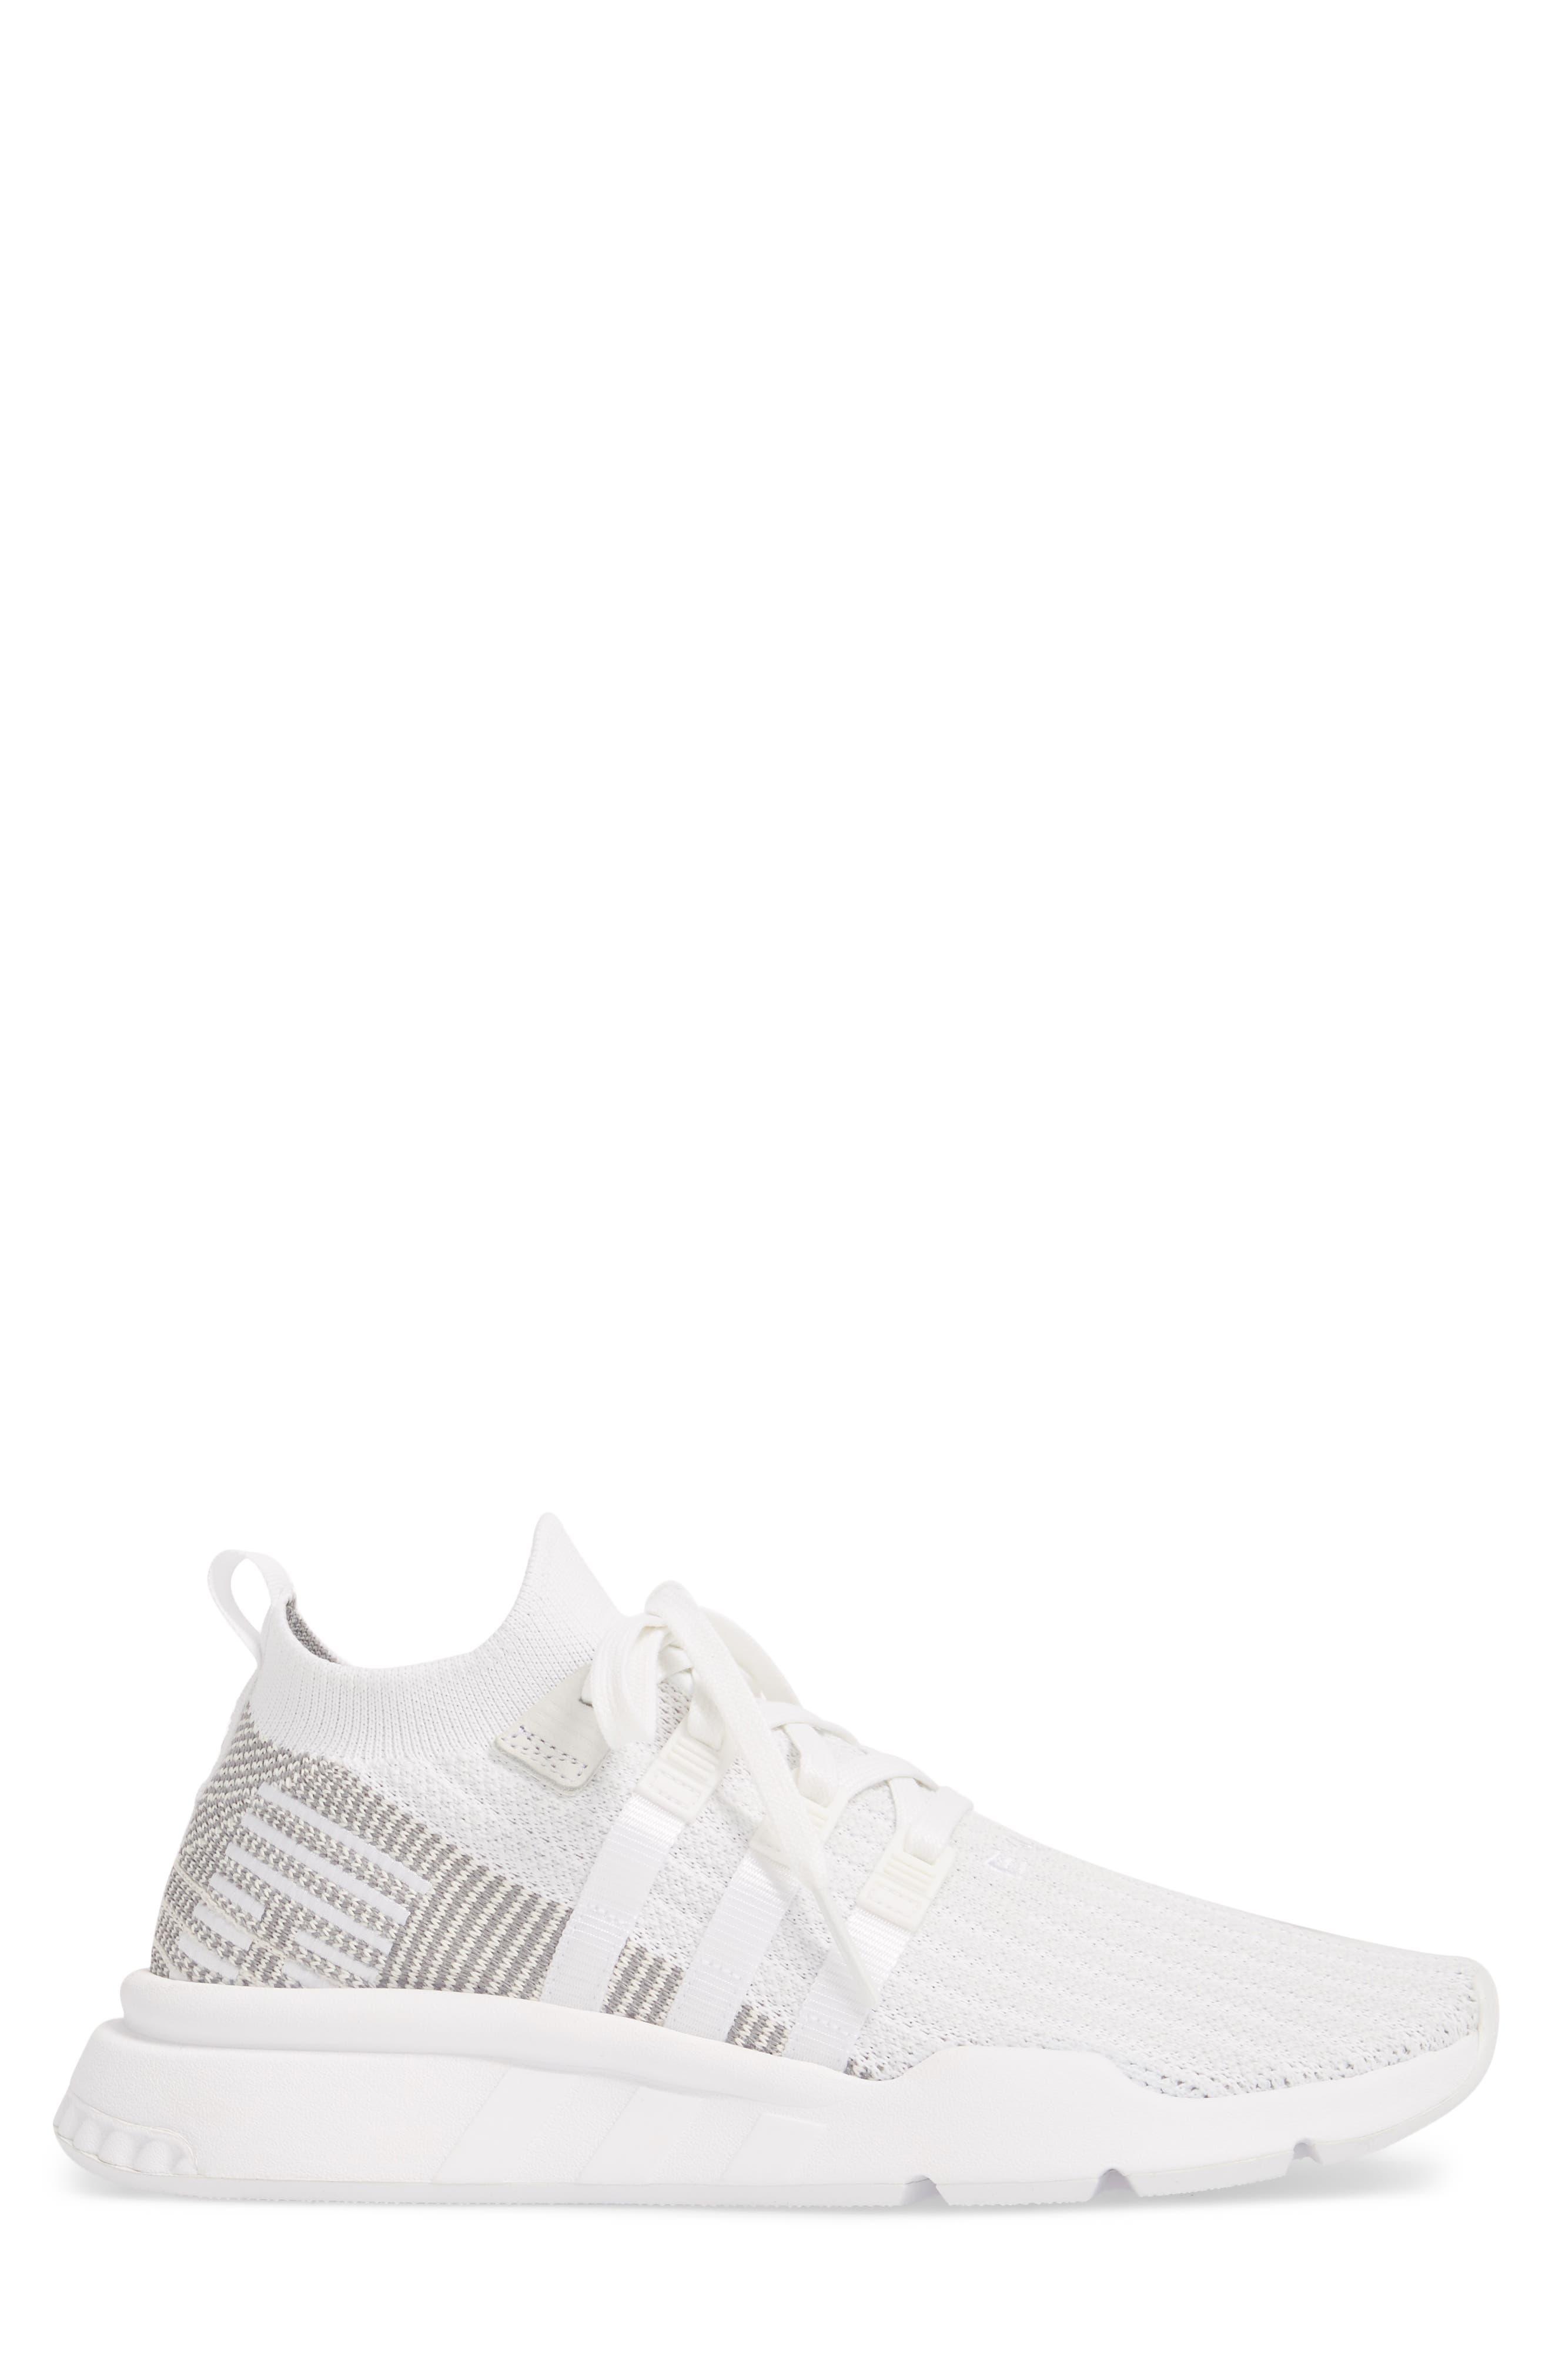 EQT Support Mid ADV Primeknit Sneaker,                             Alternate thumbnail 3, color,                             WHITE/ WHITE/ GREY